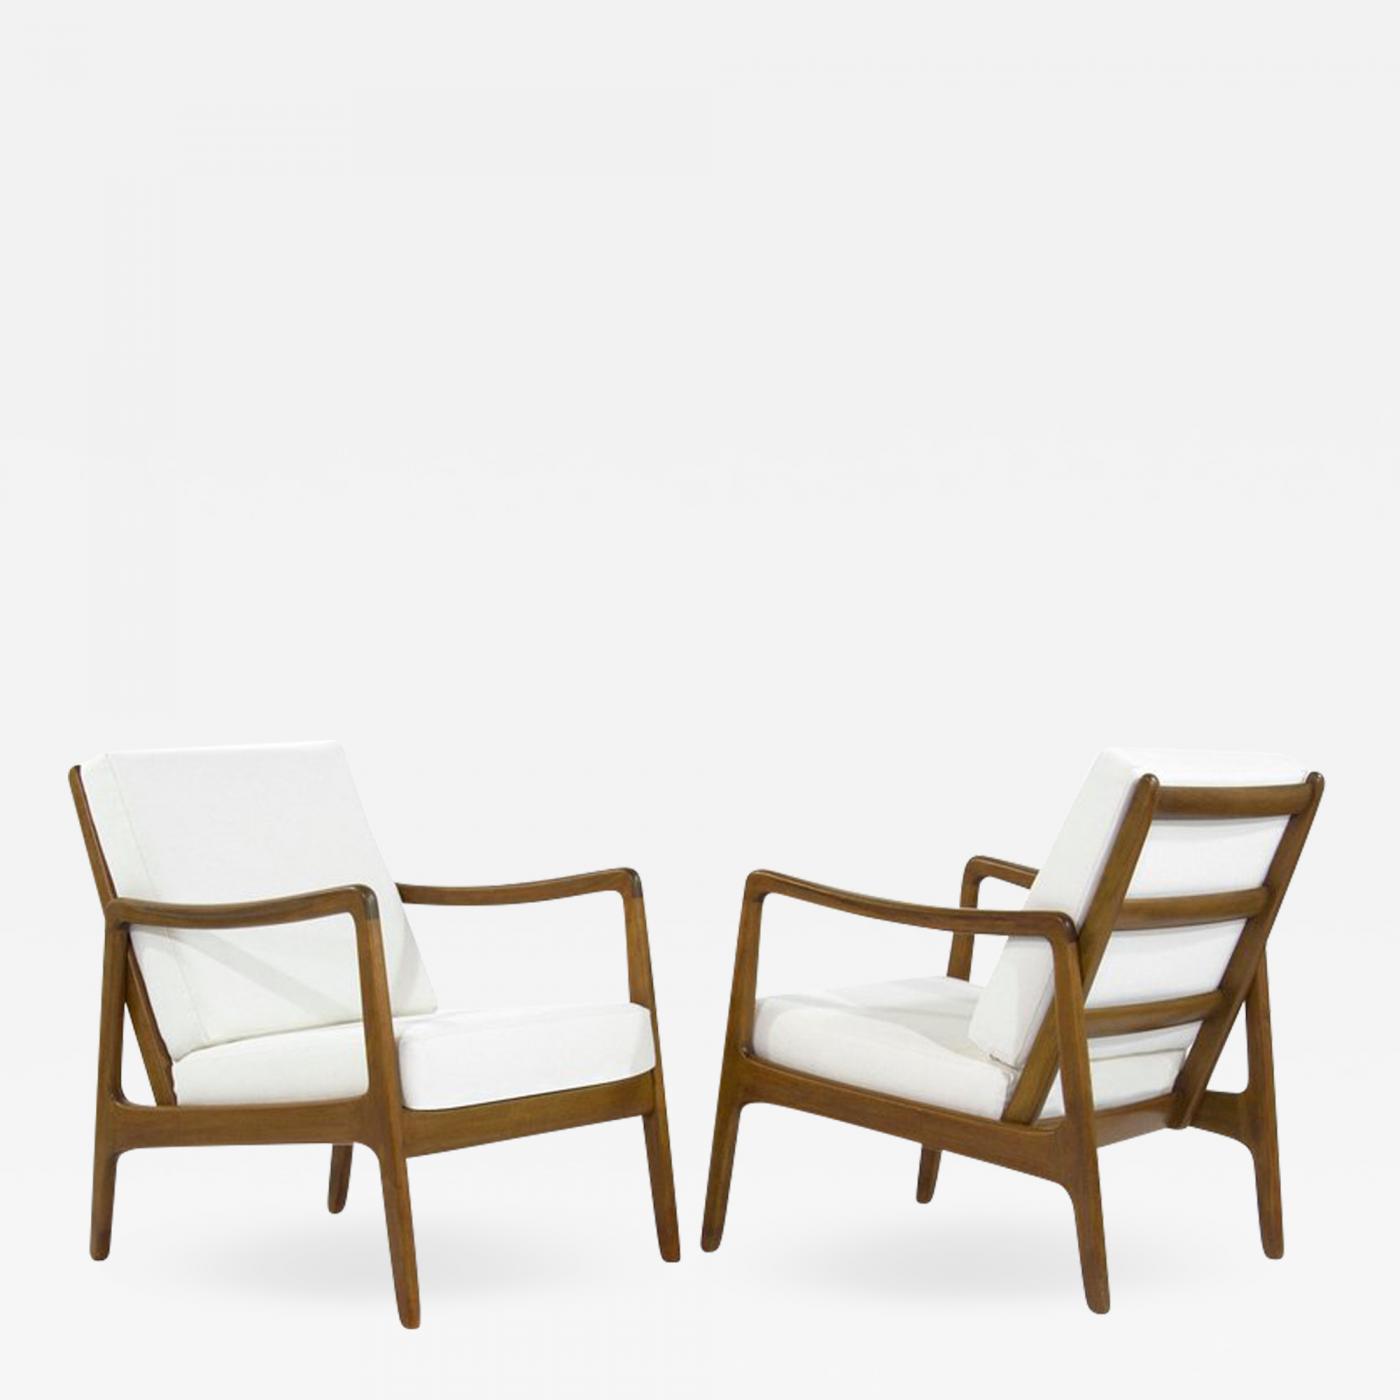 teak lounge chair yellow and gray ole wanscher scandinavian chairs model fd109 by